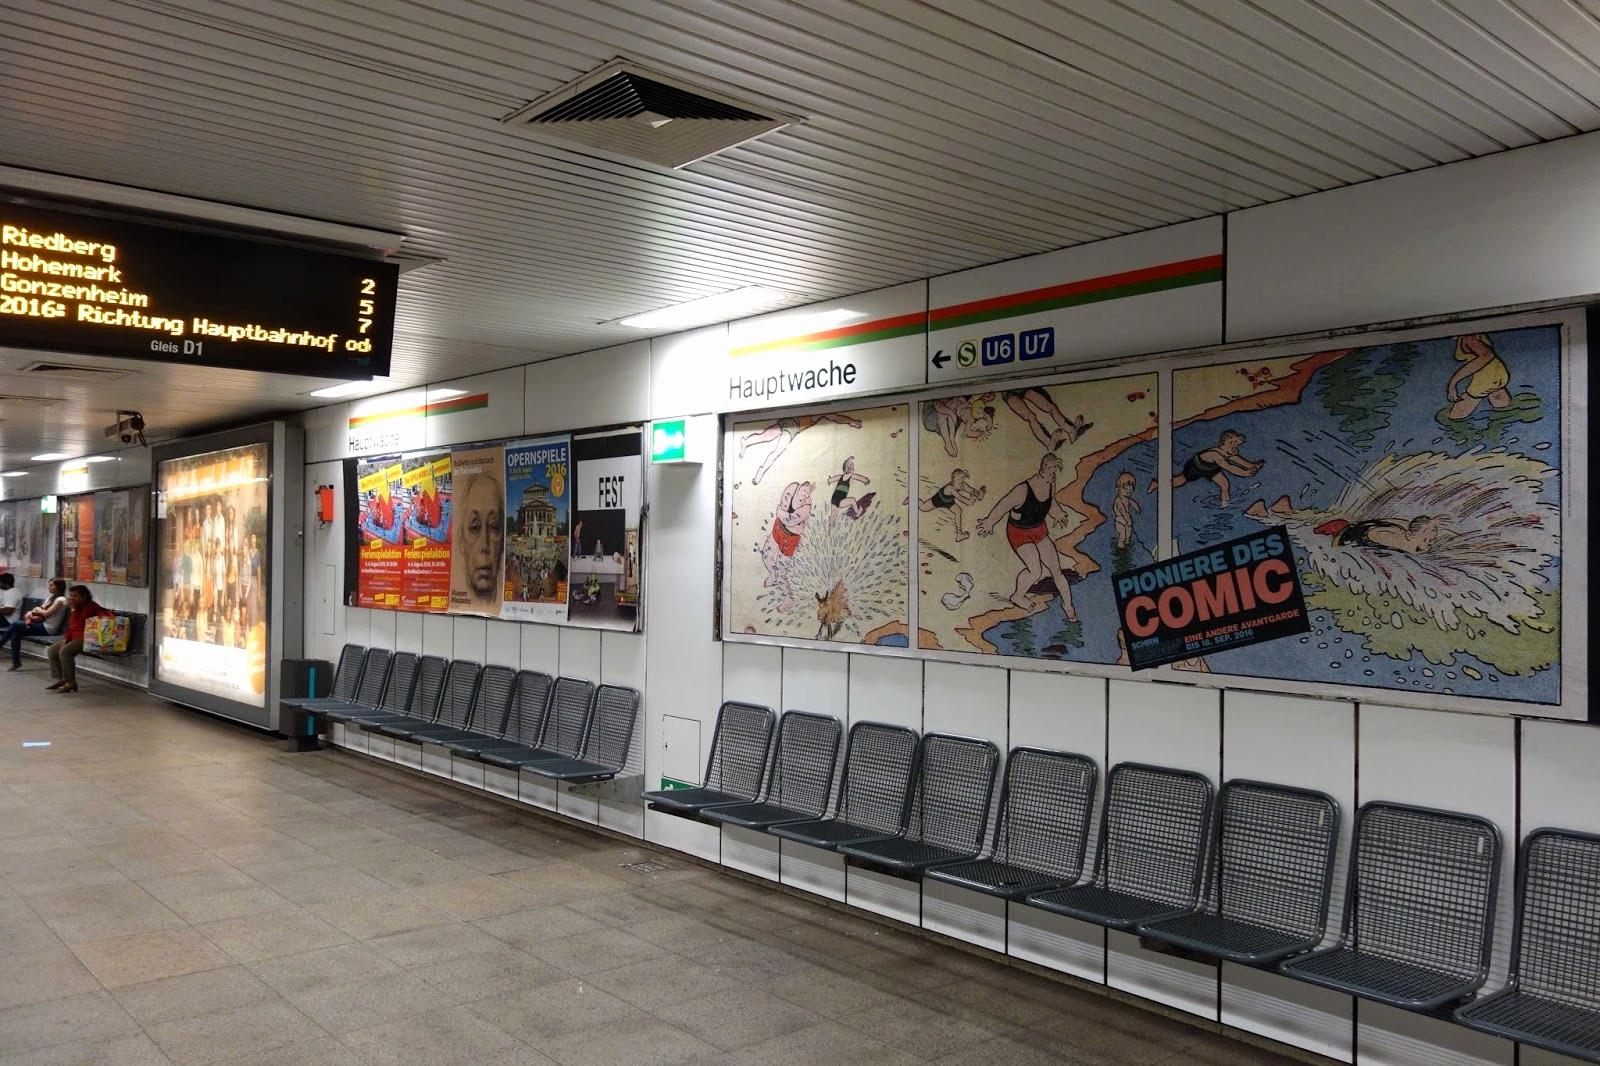 brico depot cuisine 3d unique brico depot cuisine luxury 43 beau de cuisine metro brico depot of brico depot cuisine 3d